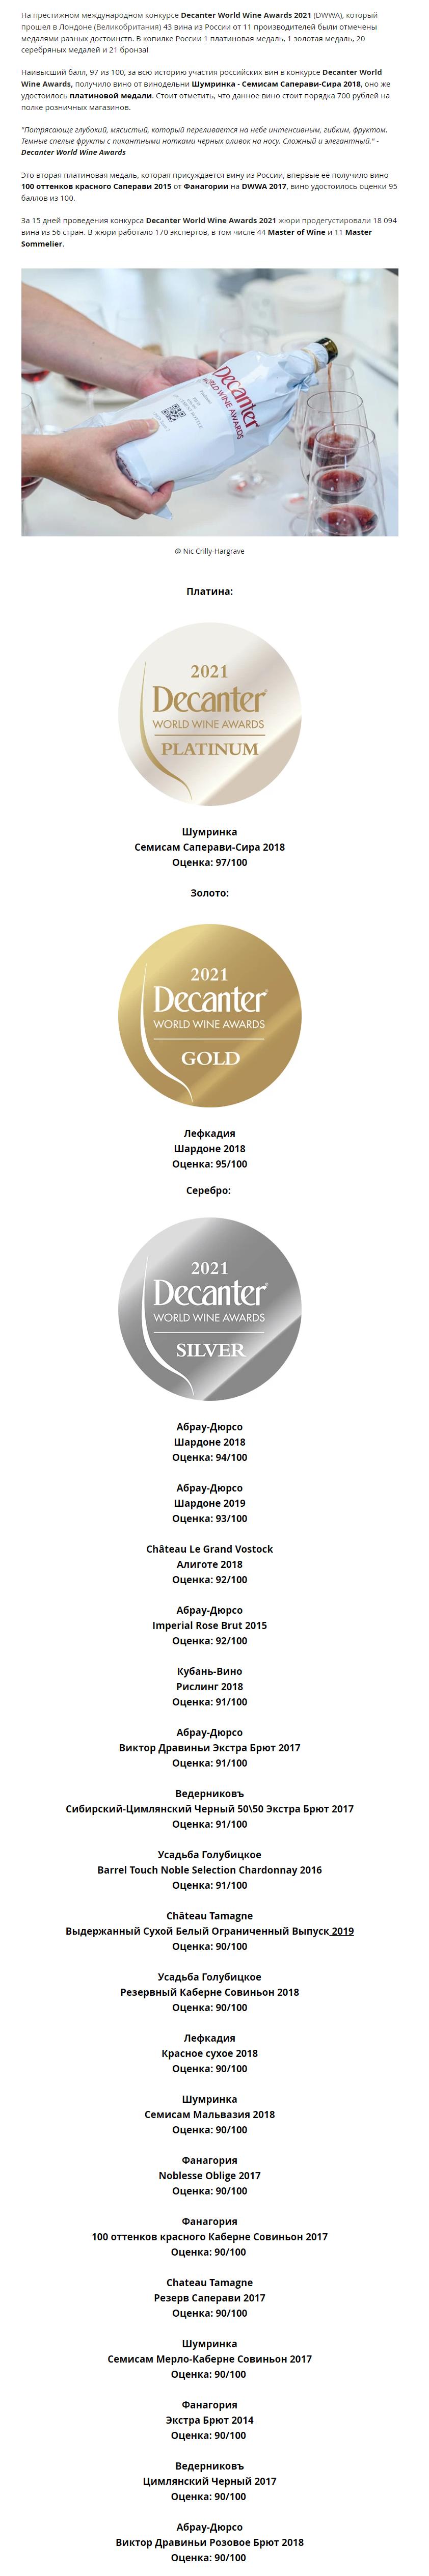 Fire-Shot-Capture-916-43-Decanter-World-Wine-Awards-202-www-wineit-ru